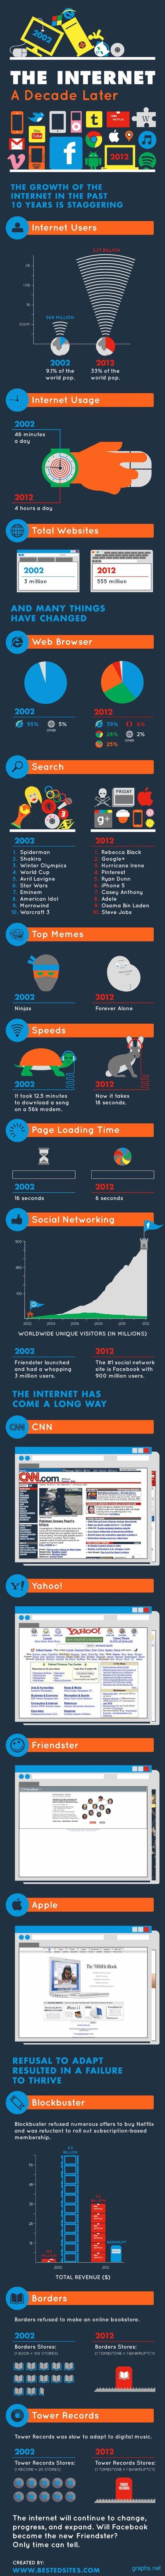 Internet Growth Since 2002